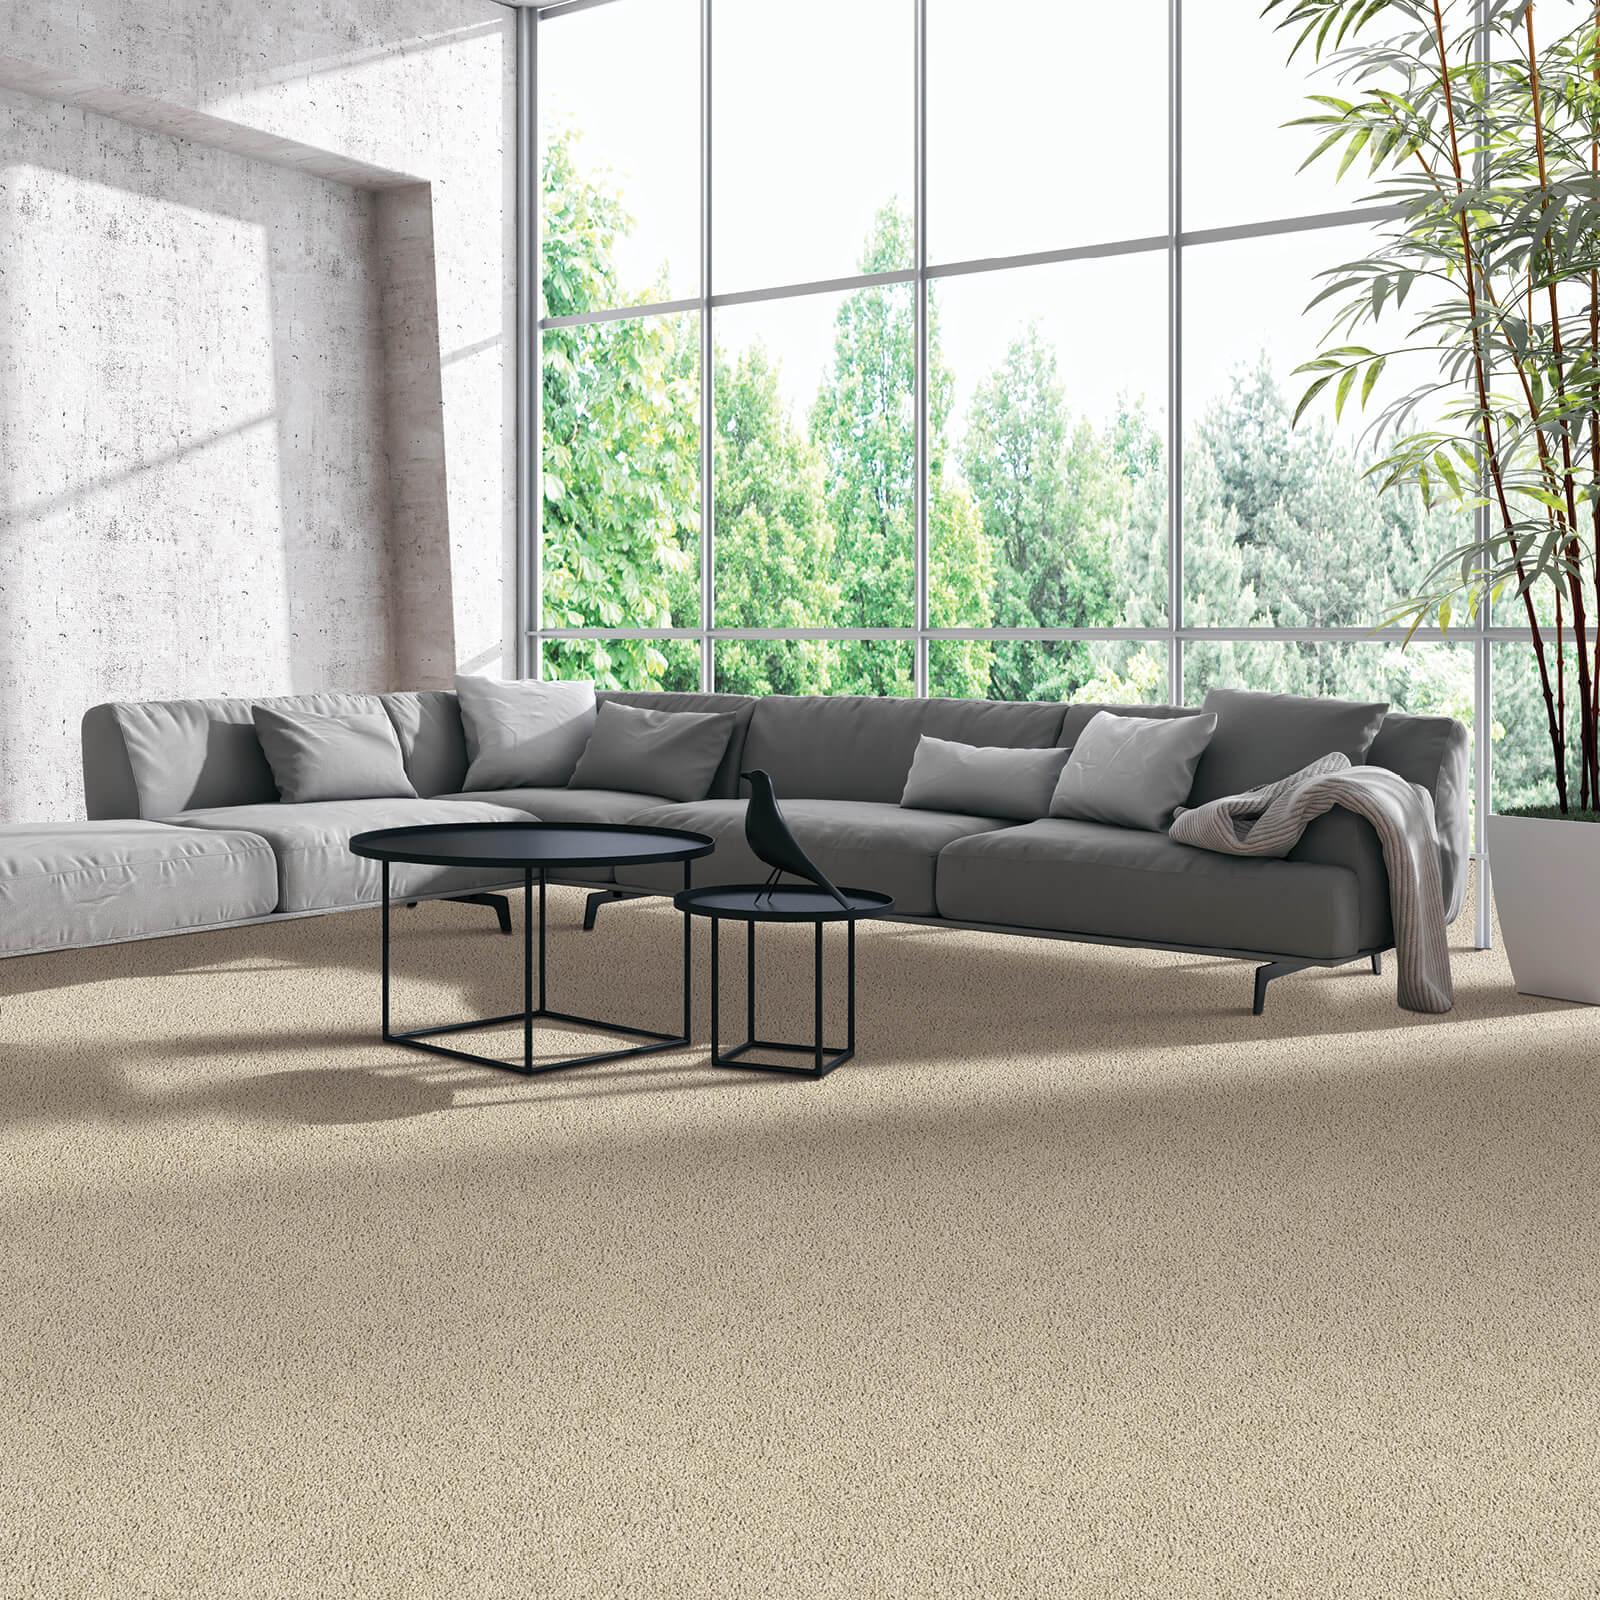 Natural Stone Flooring | McSwain Carpet & Floors